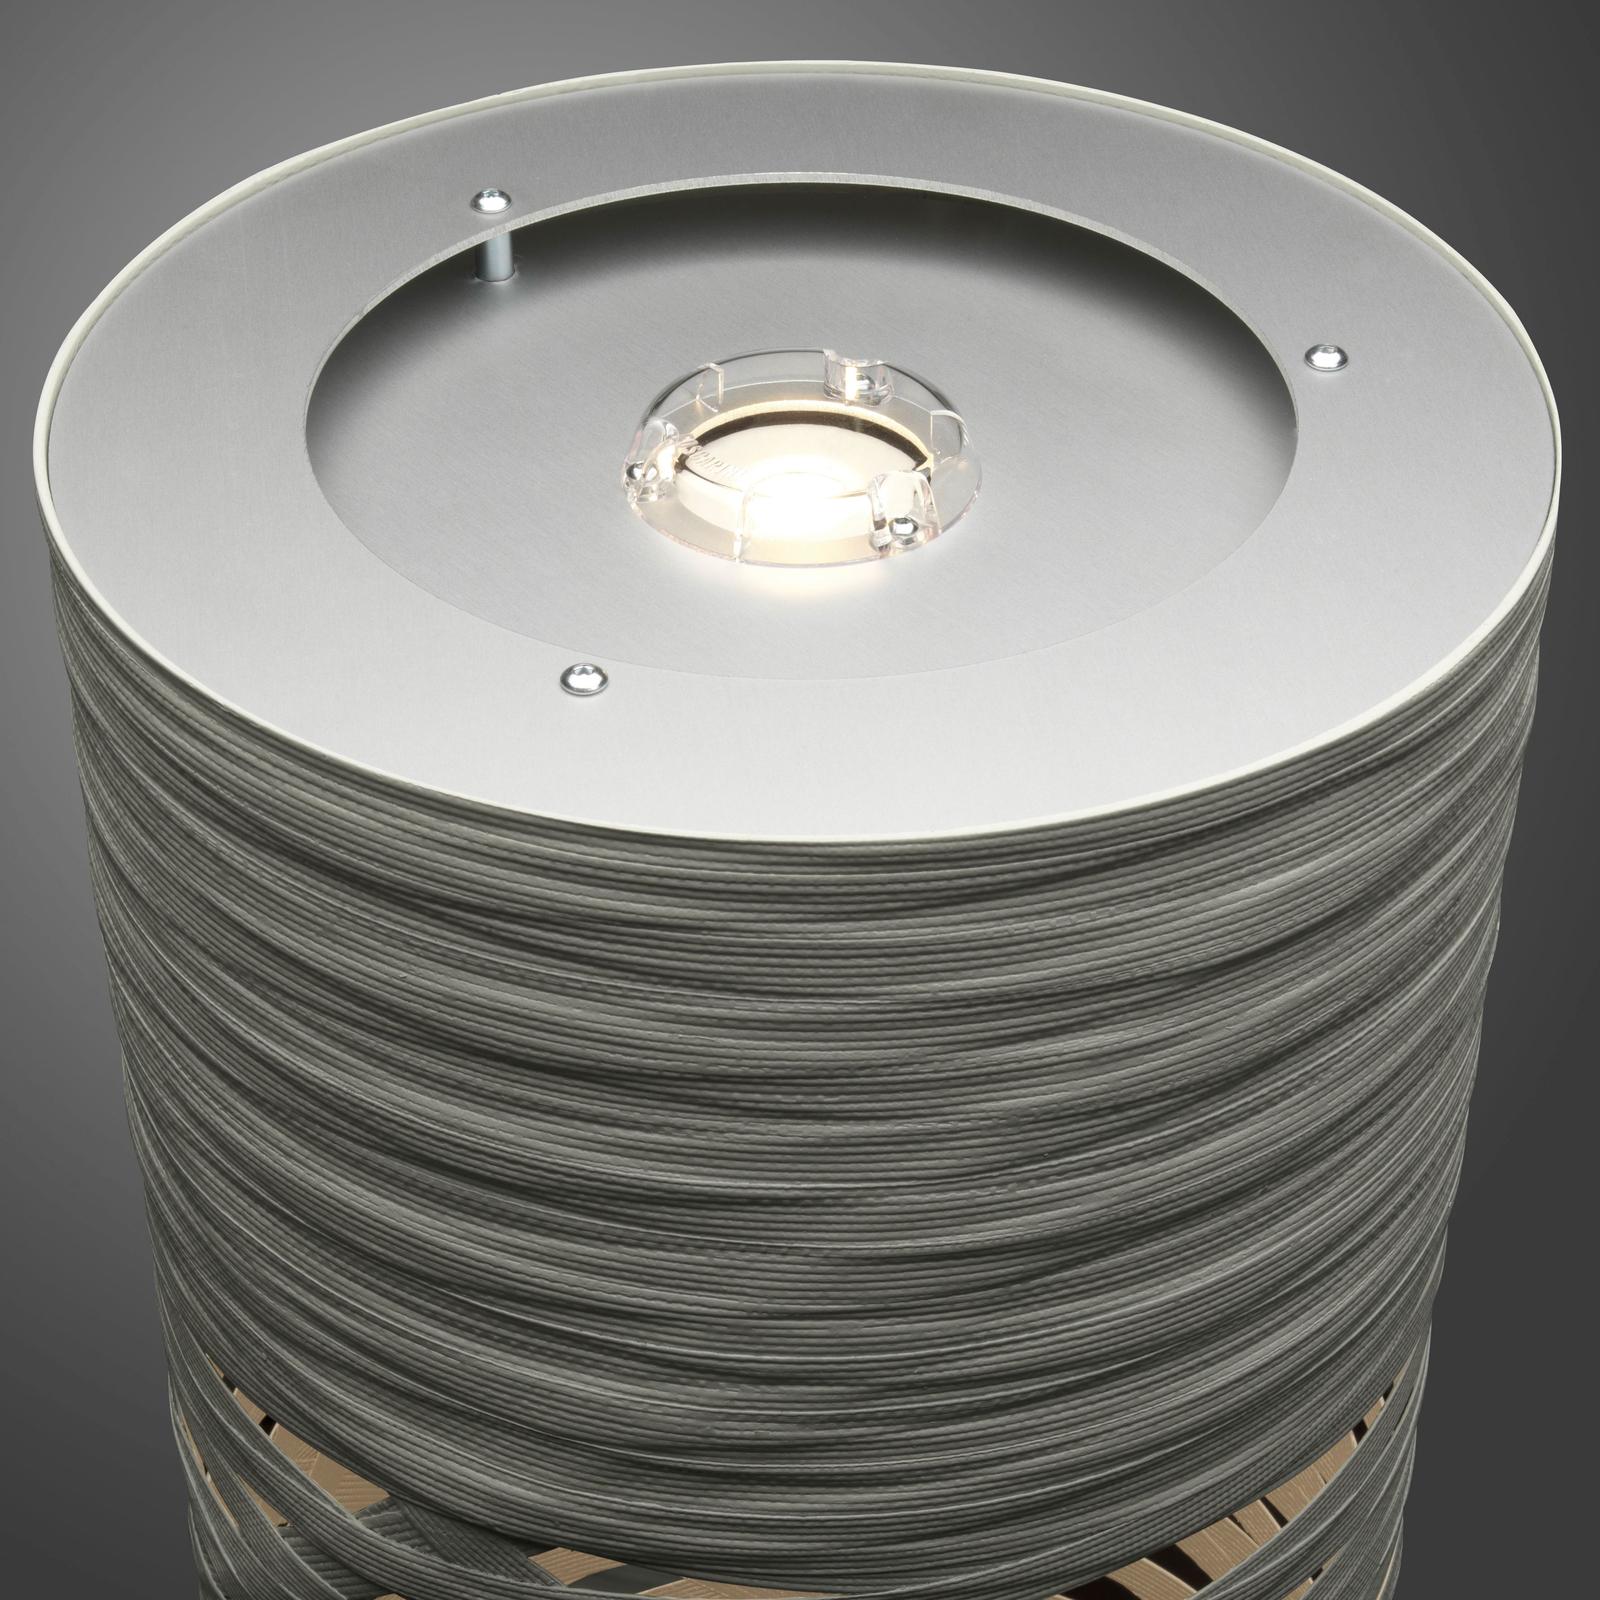 Foscarini Tress media vloerlamp, wit